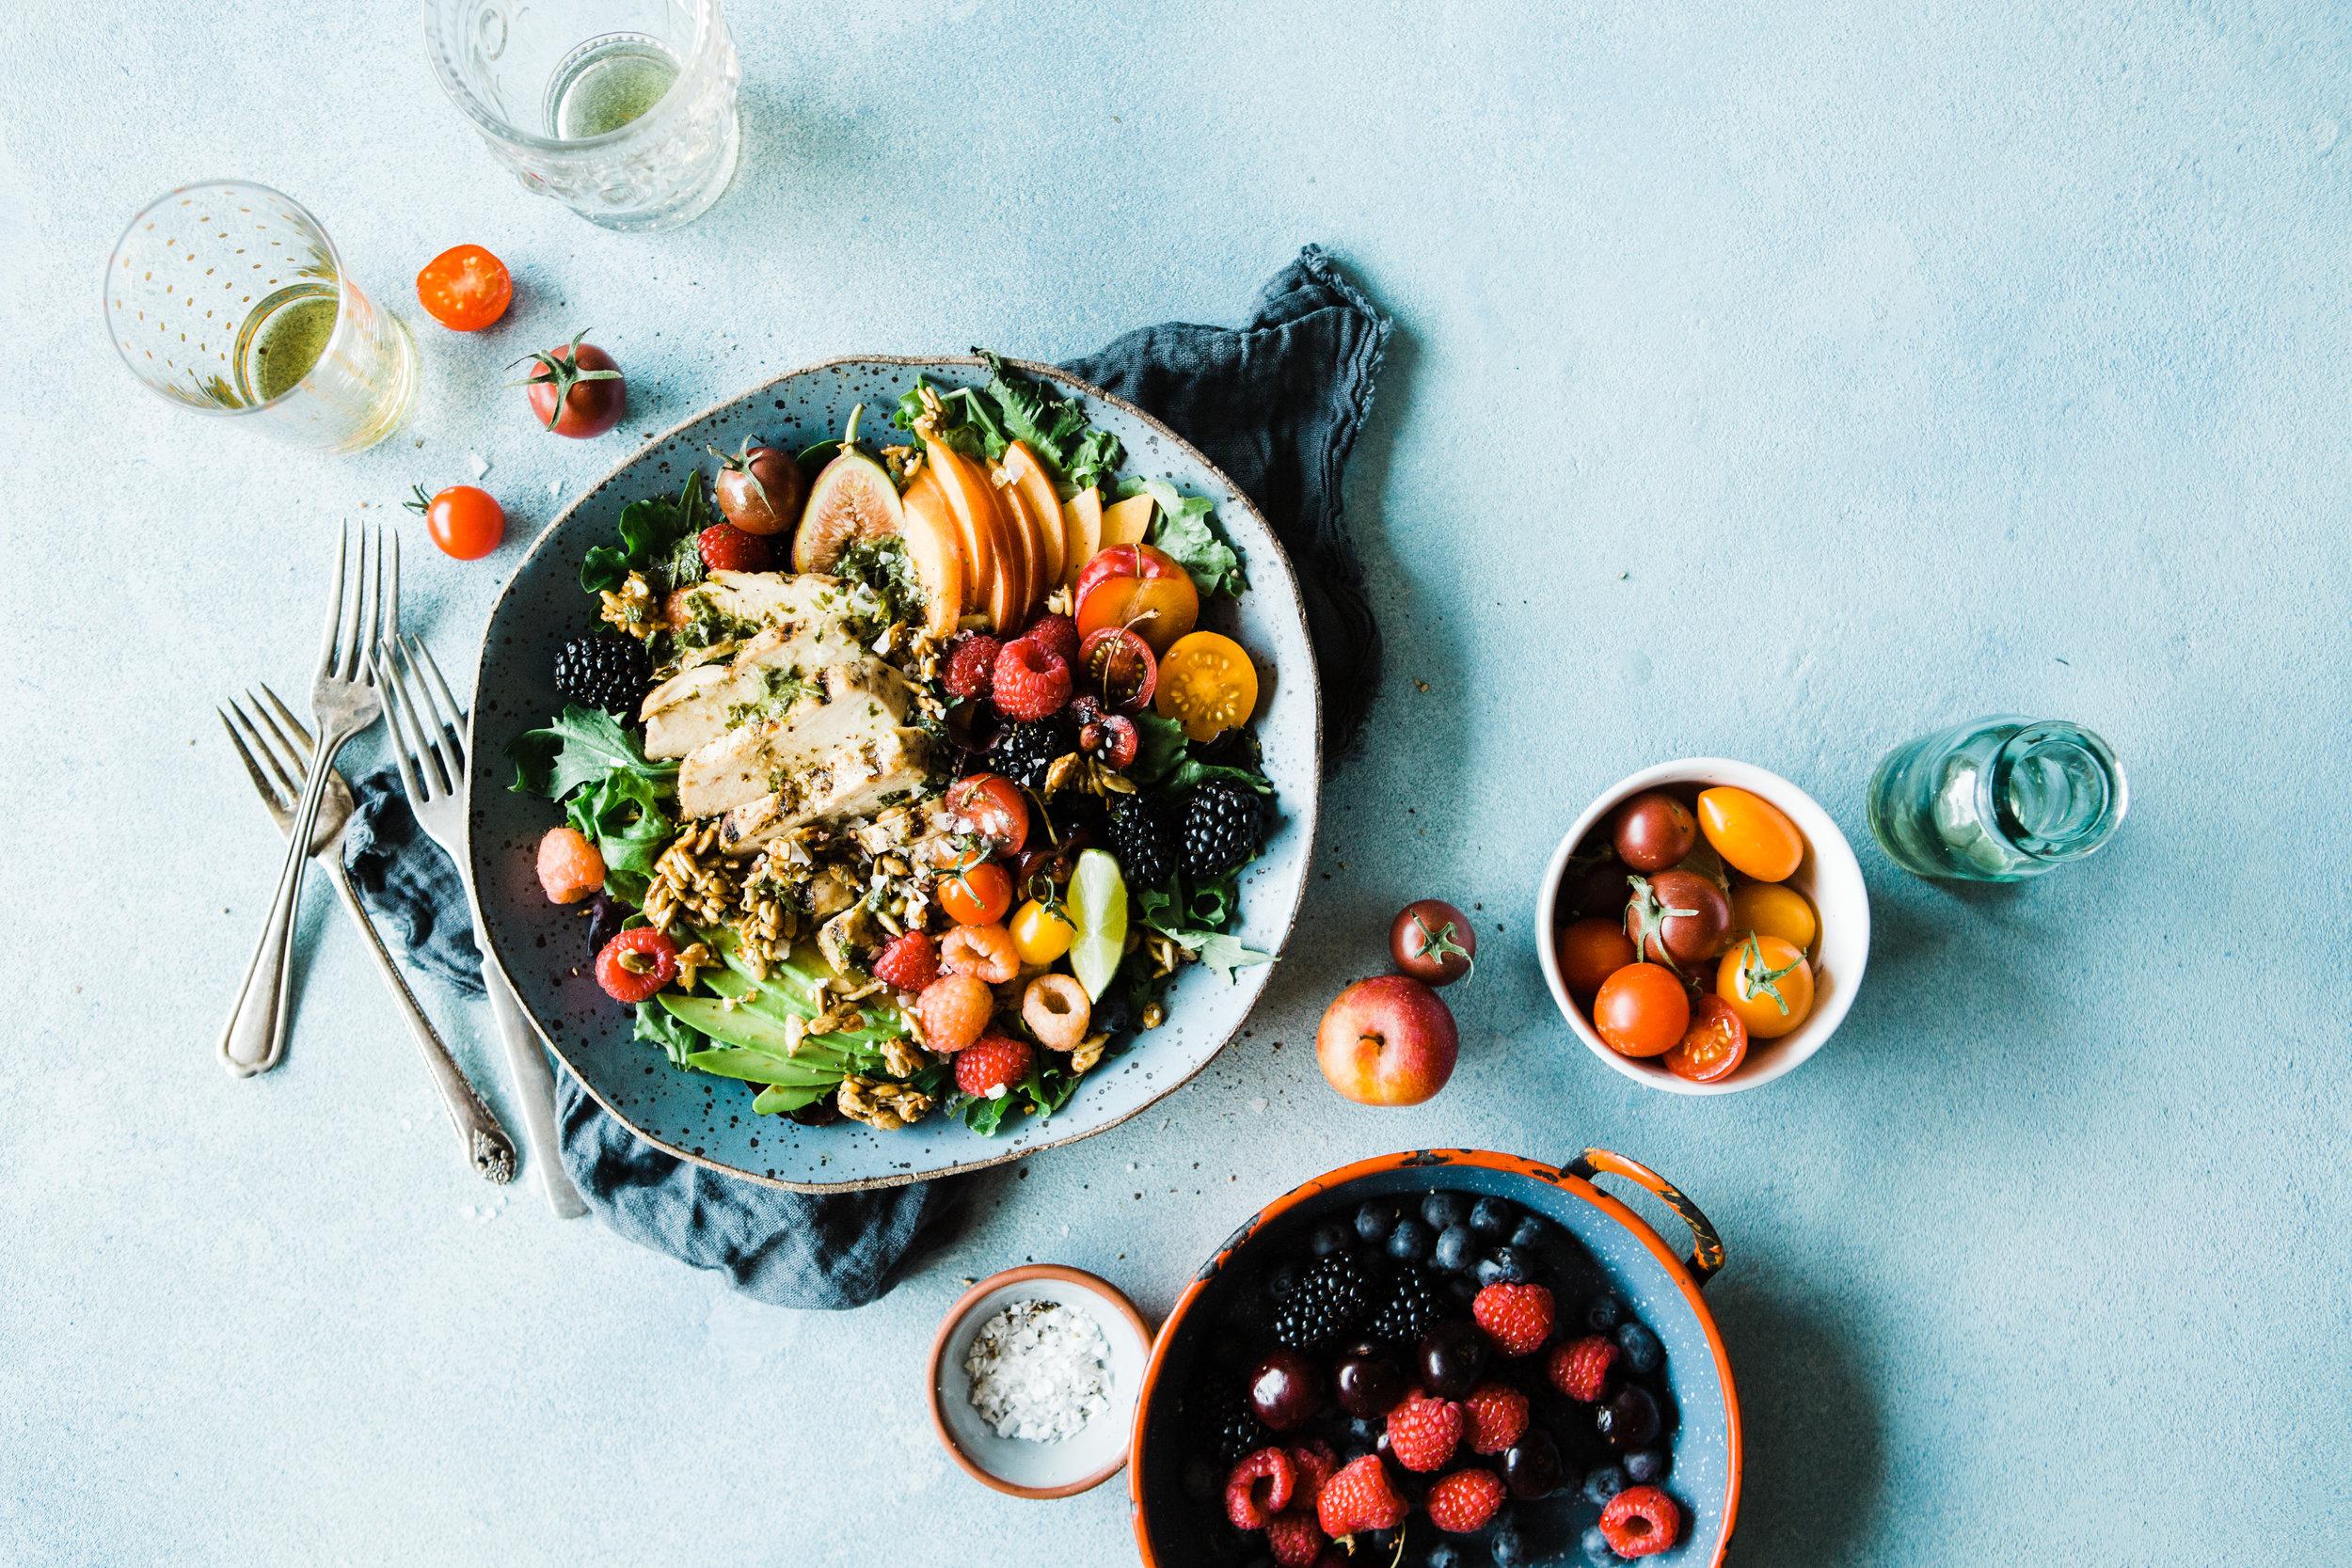 2018-07 HTCLAFS - Summer Thrive Salad 2b.jpg